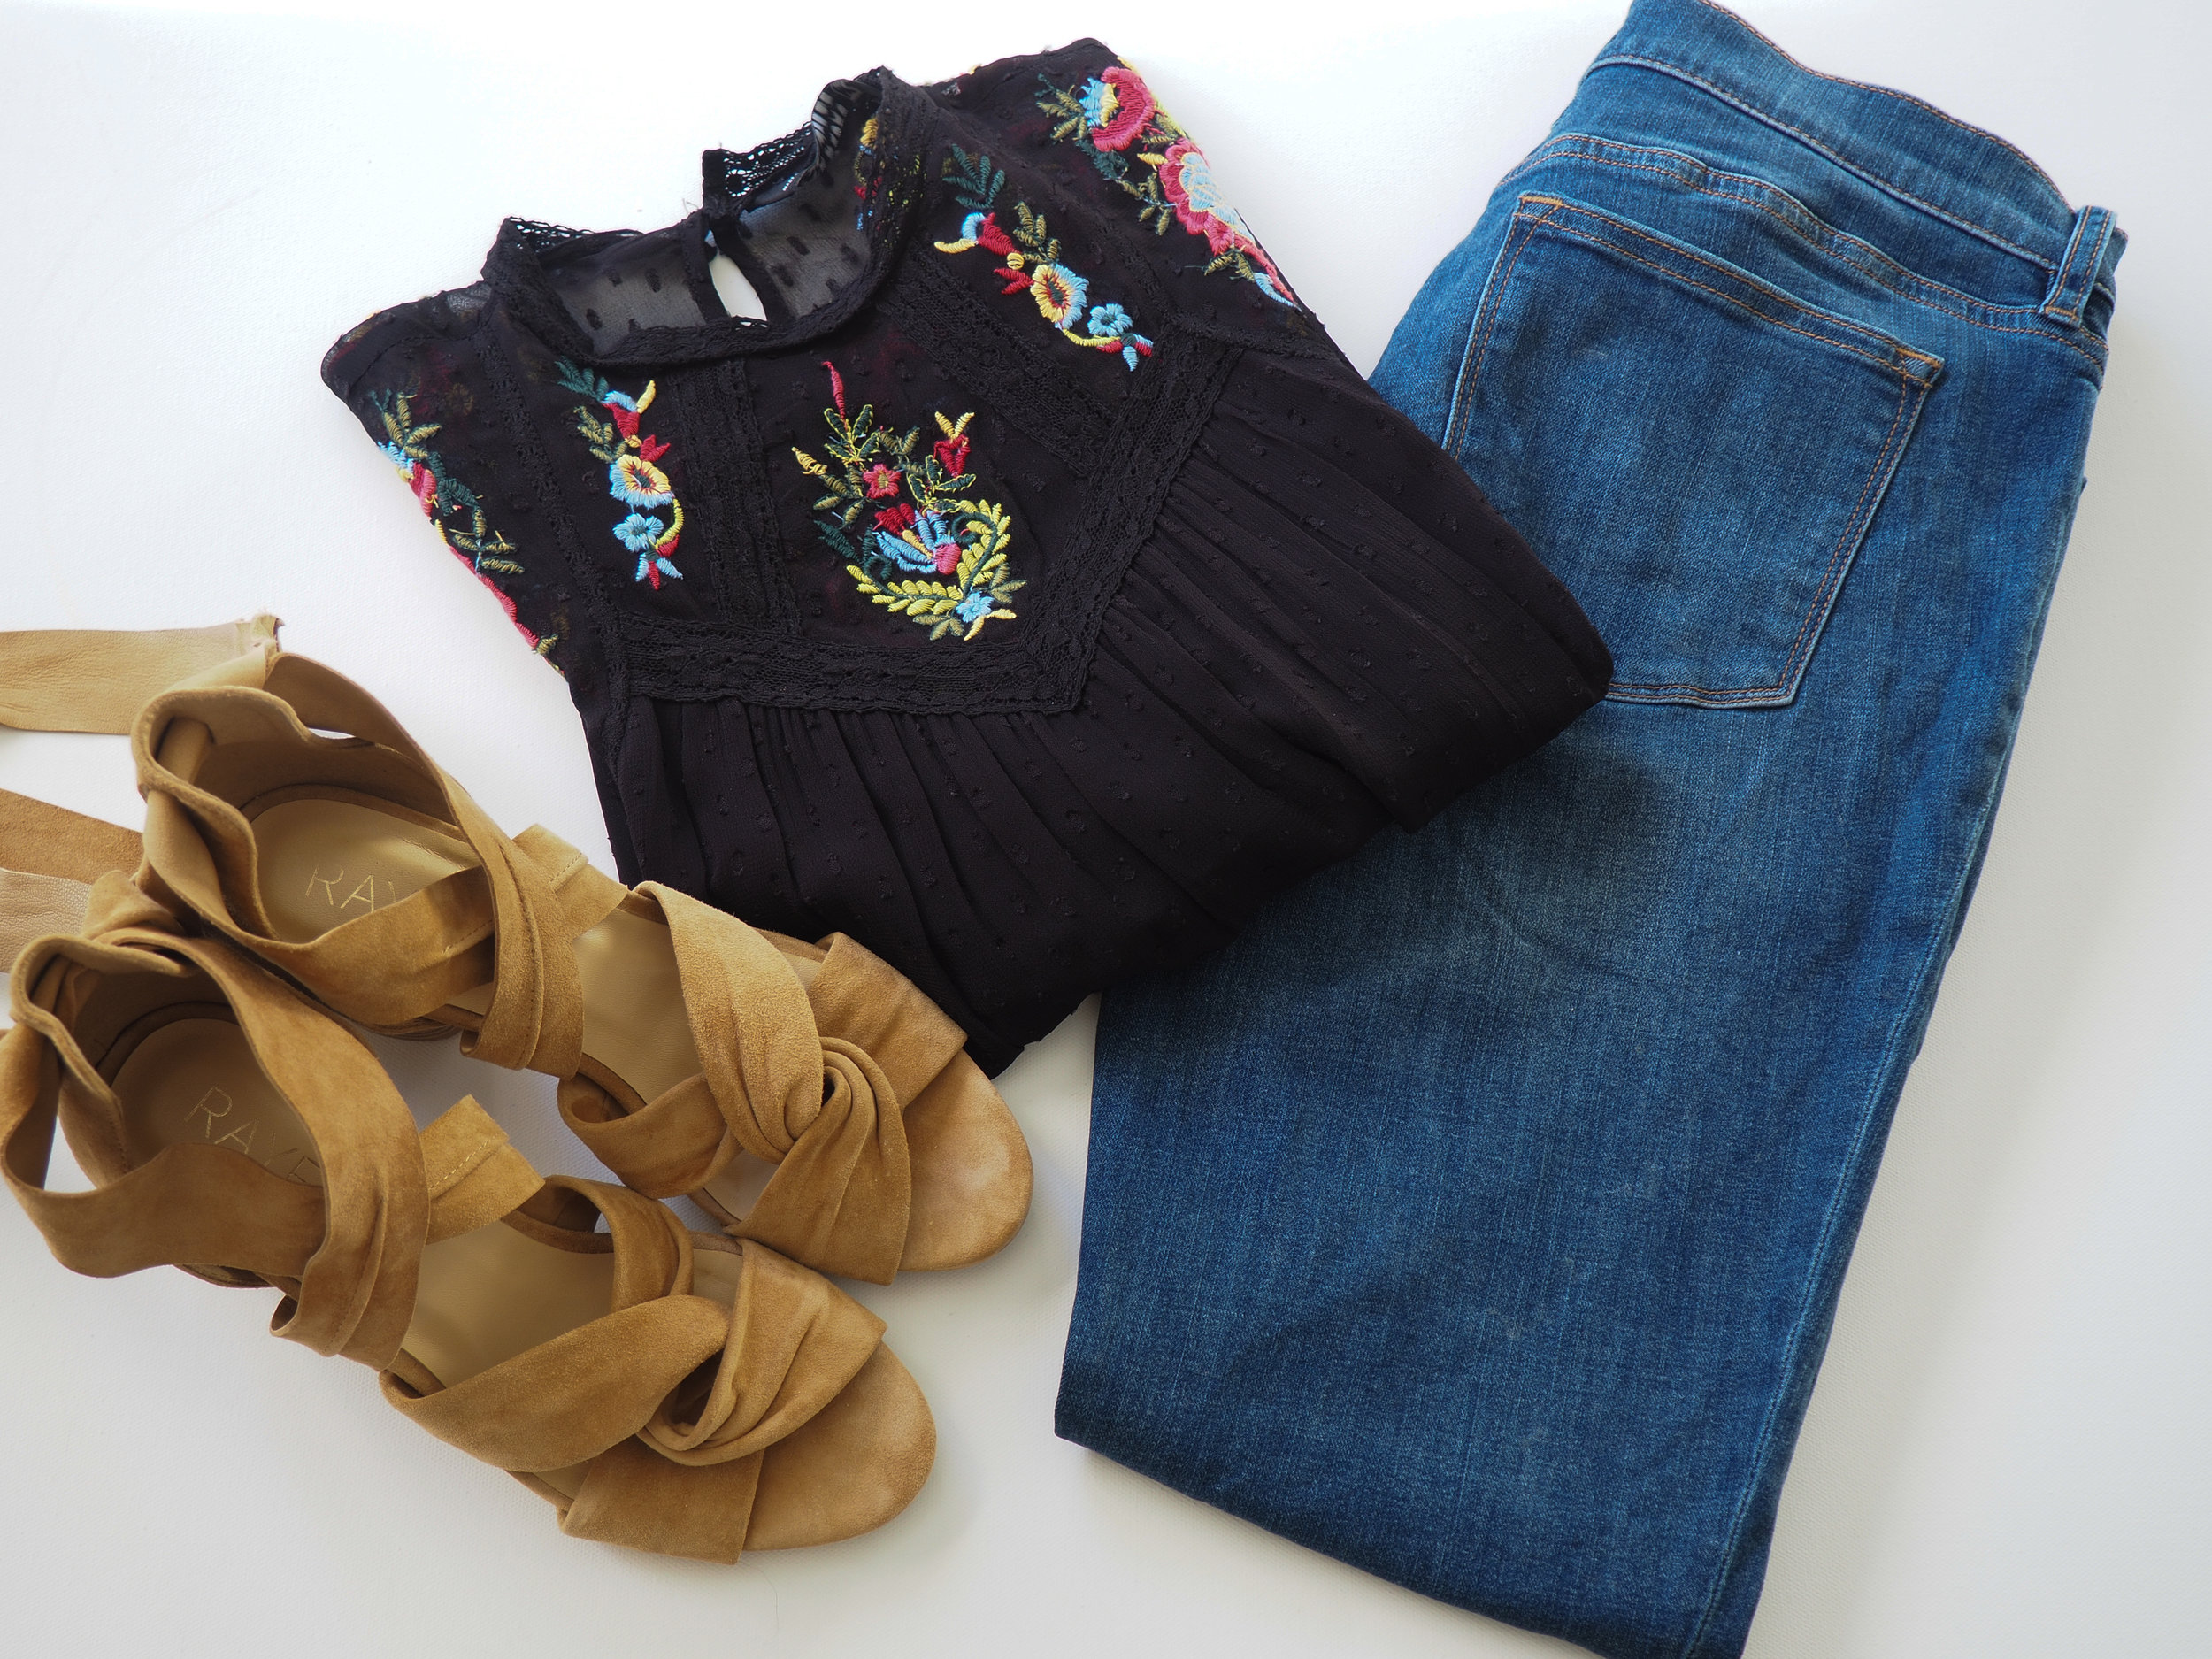 Floral Top  (Similar)  |  Jeans  | Sandals  (Same style, different color)